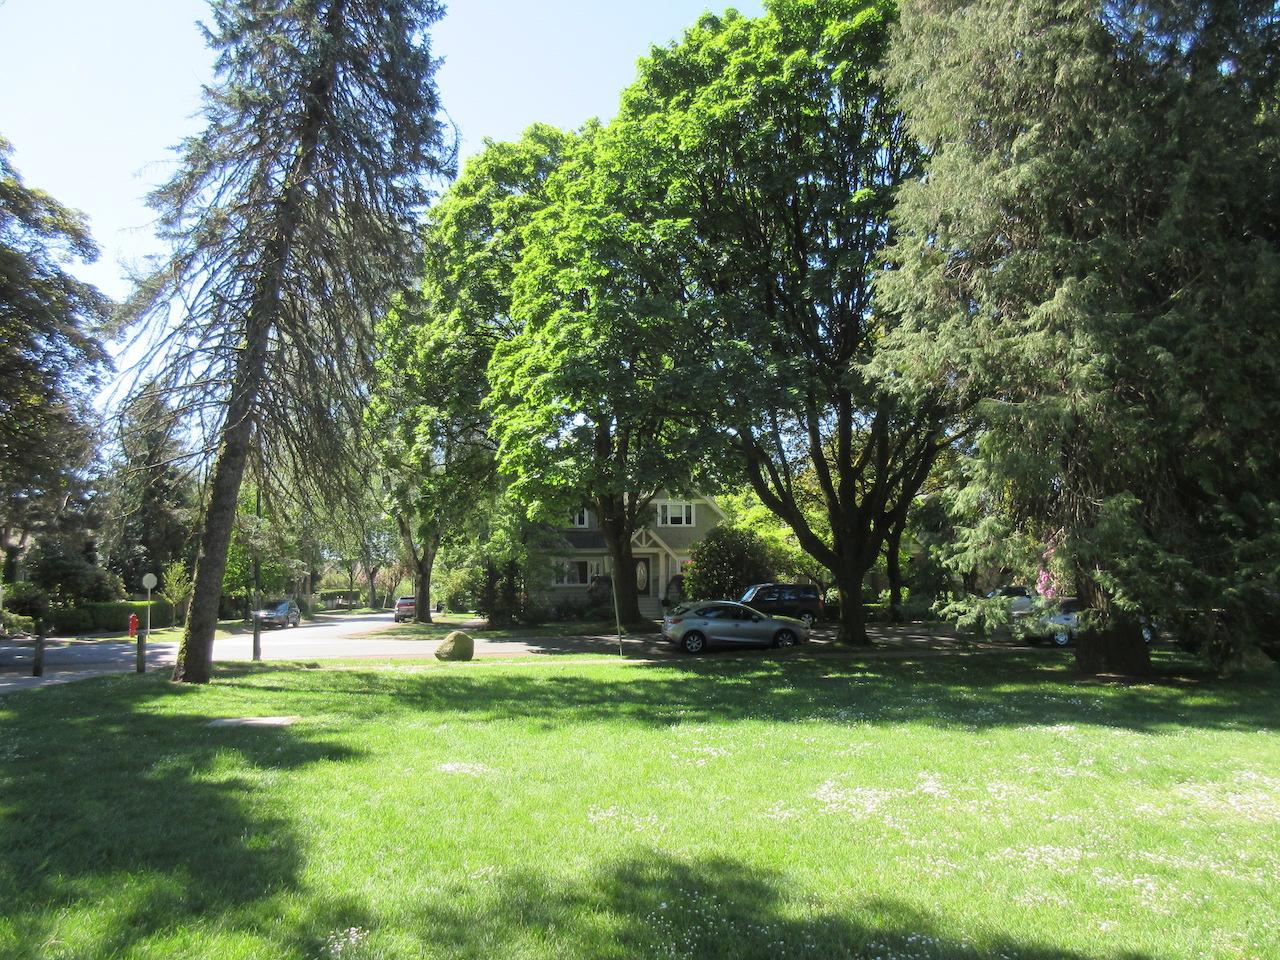 Vancouver Dunbar UBC Urban City Park and Houses